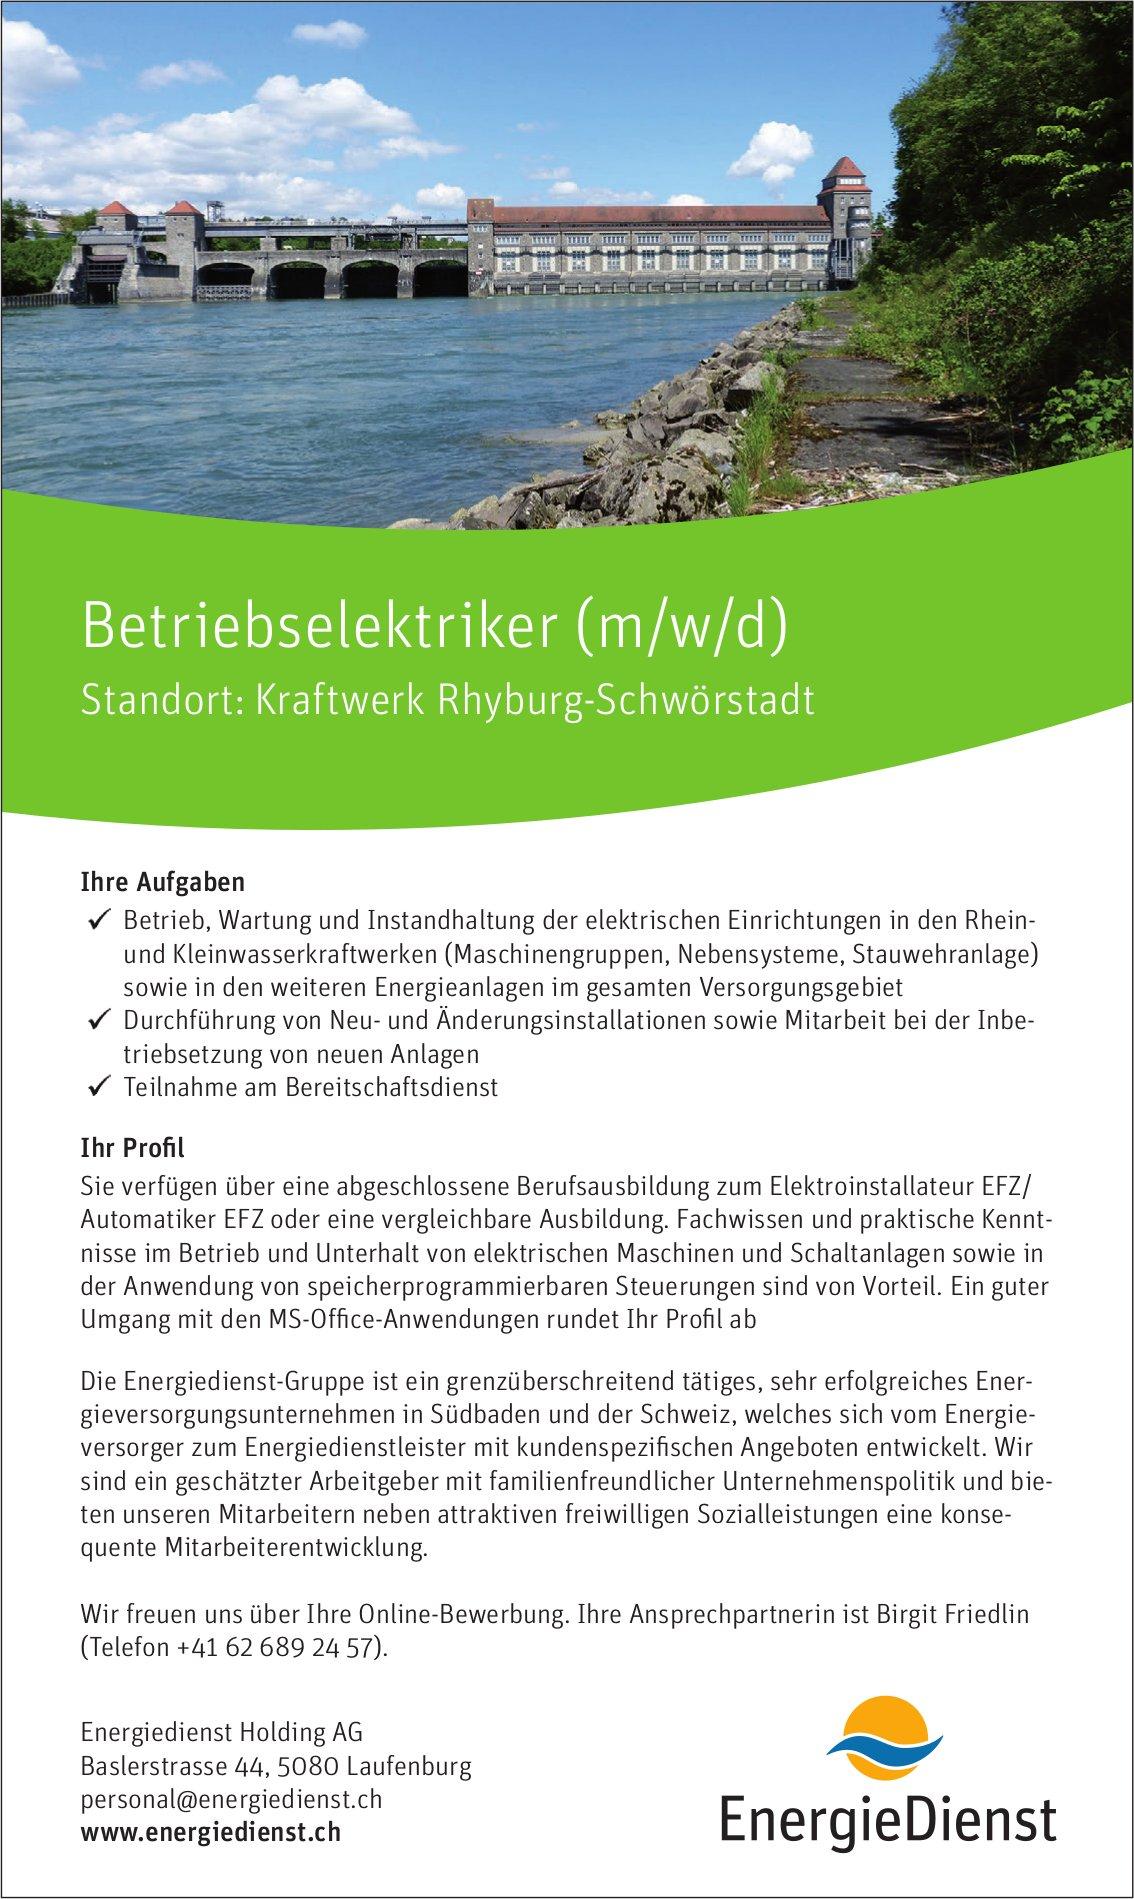 Betriebselektriker (m/w/d) bei Energiedienst Holding AG